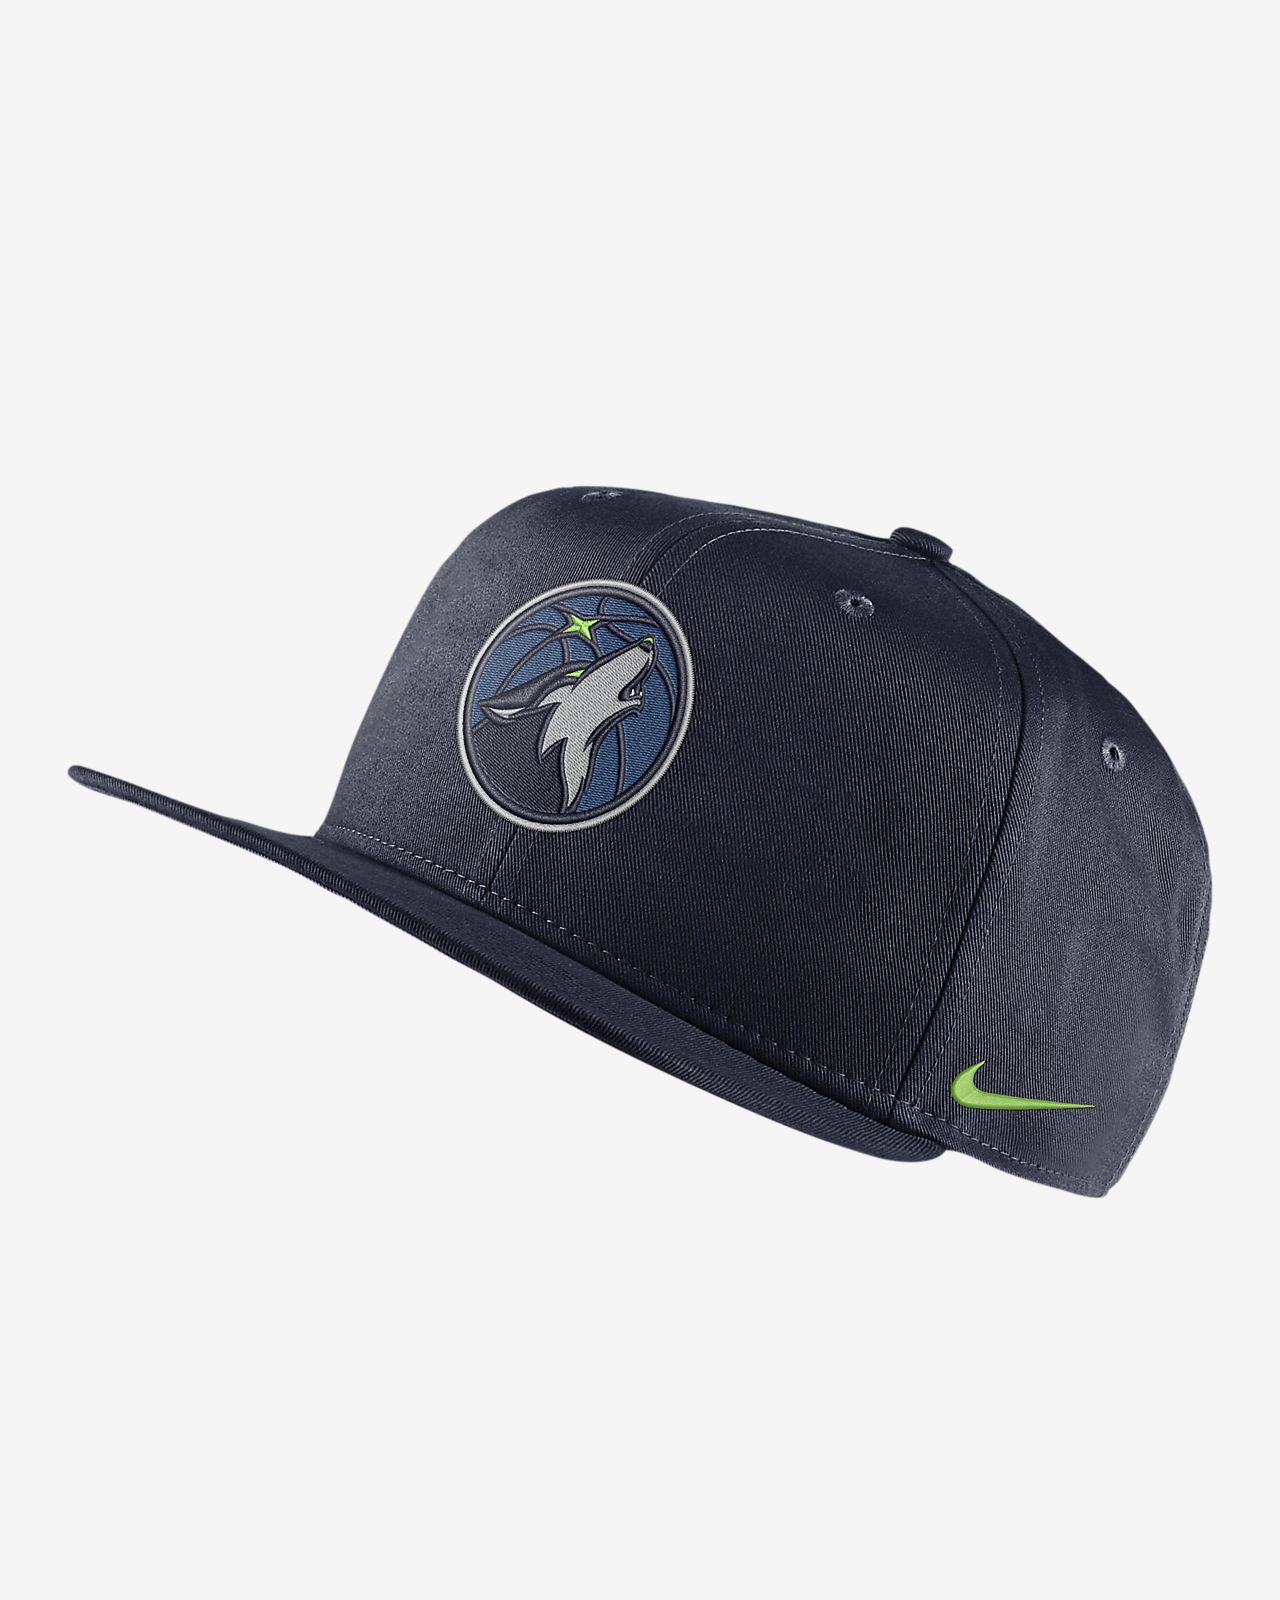 NBA-keps Minnesota Timberwolves Nike Pro